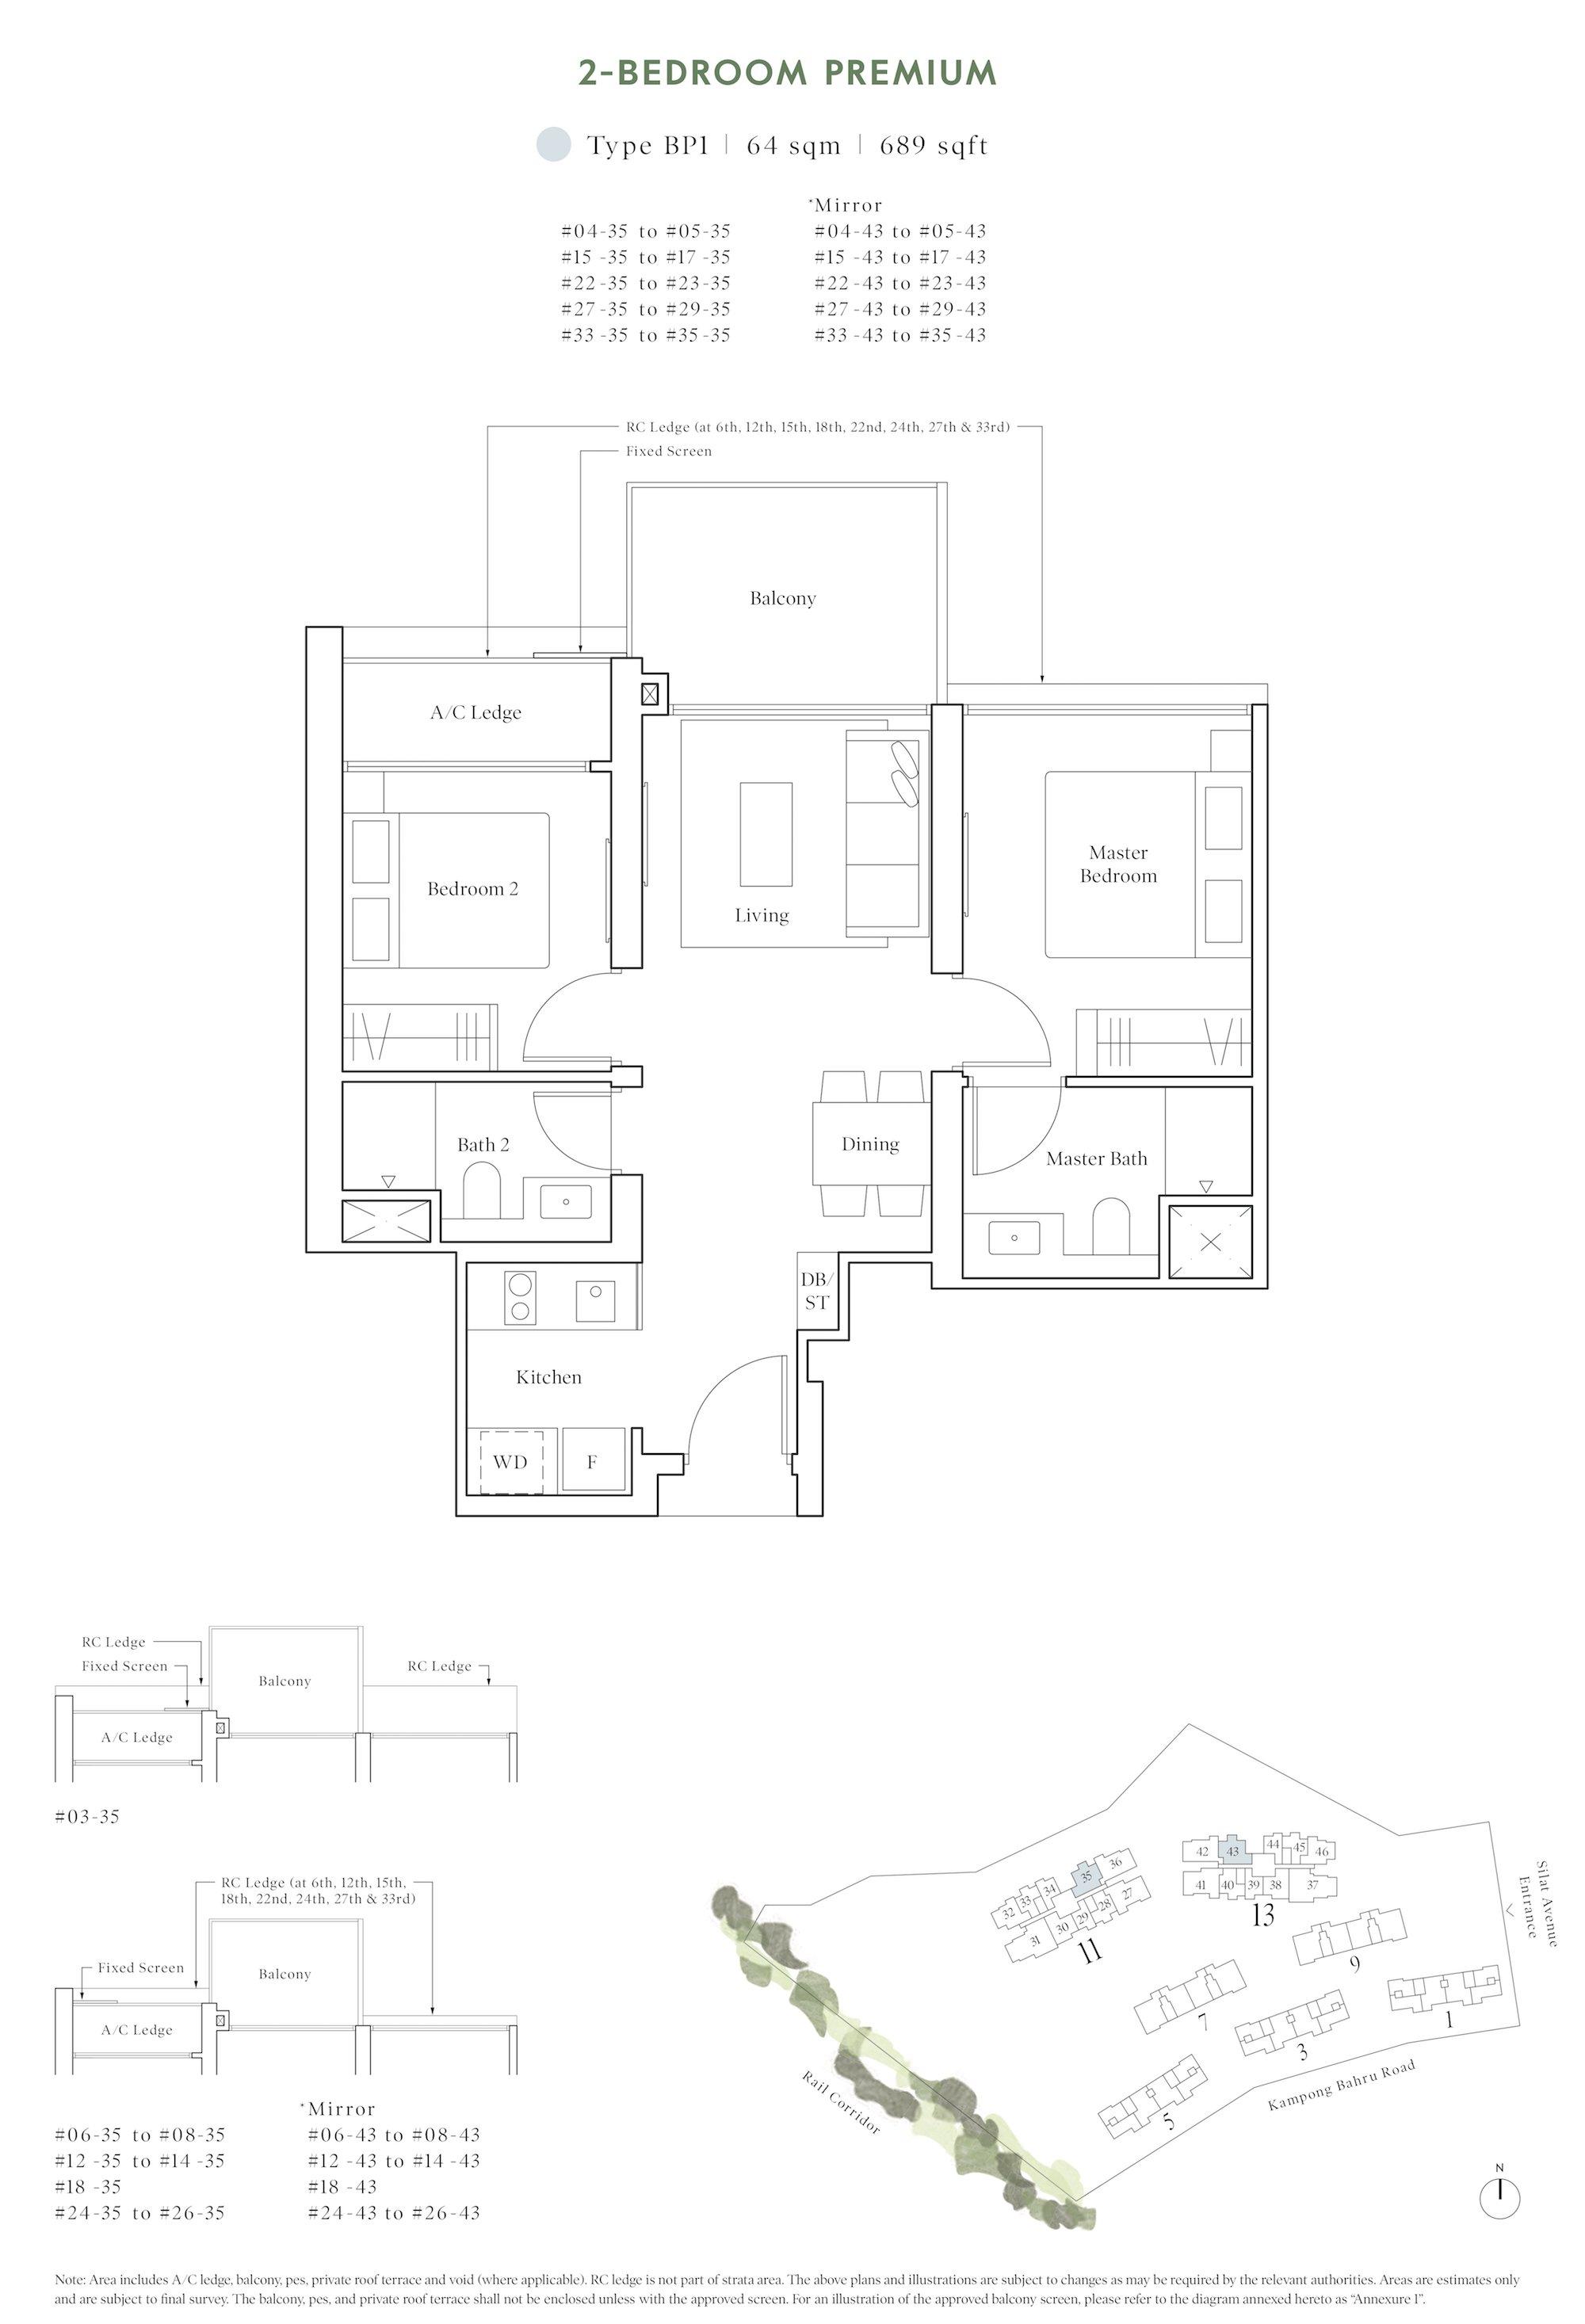 Avenue South Residence 南峰雅苑 horizon floor plan 2-bedroom bp1